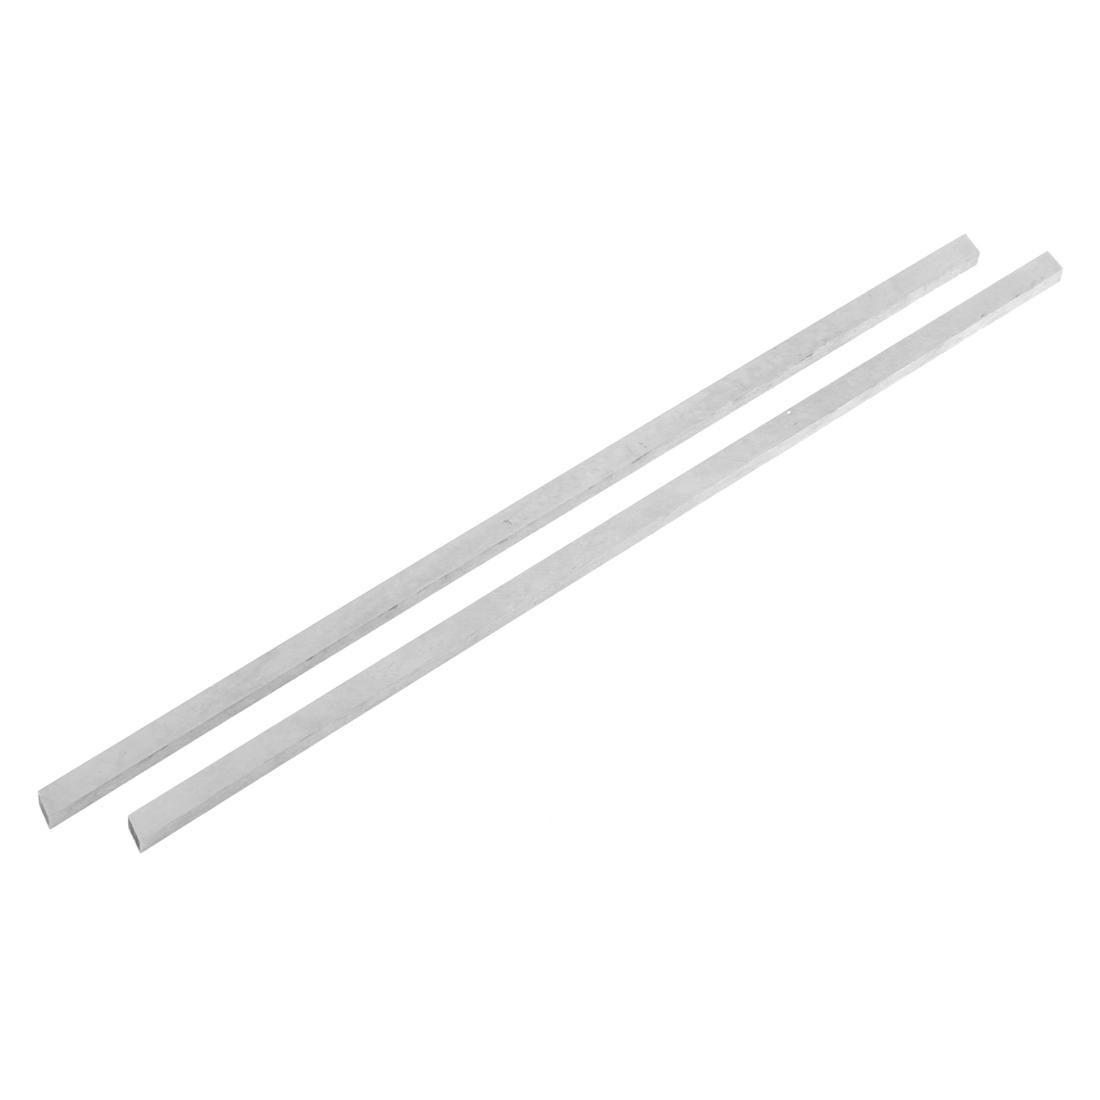 CNC Lathe HSS Square Bit Cutting Boring Bar Cutter Tool 3mmx5mmx200mm 2pcs